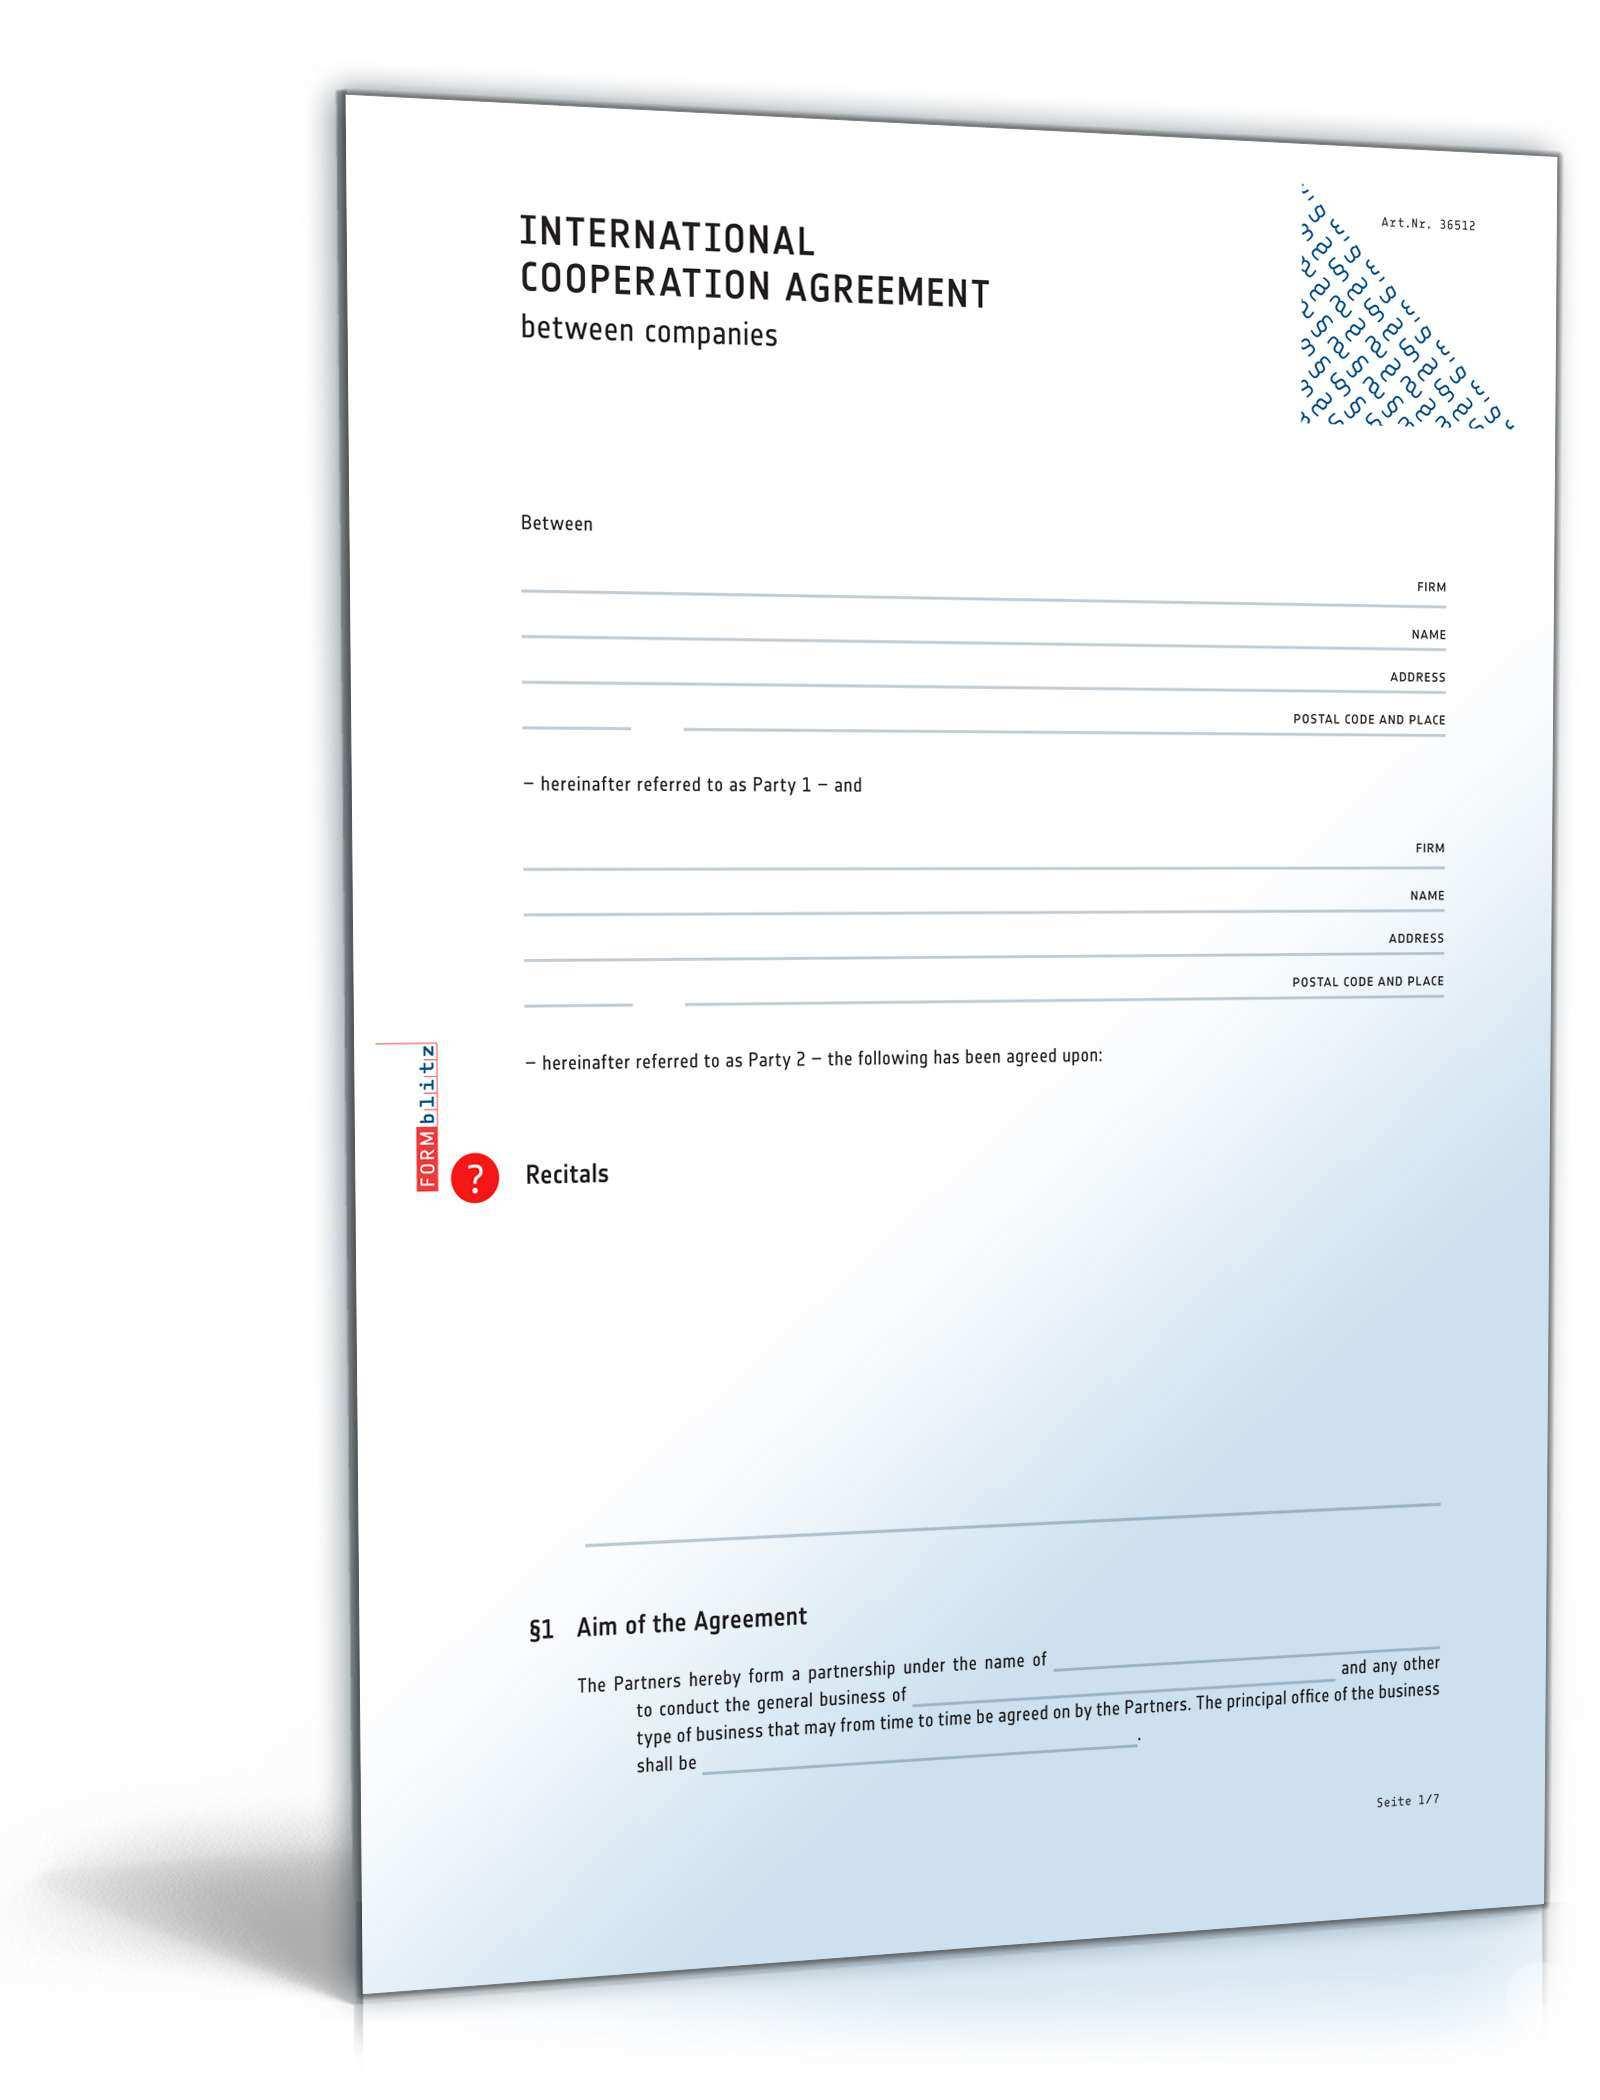 Internationaler Kooperationsvertrag Englisch Muster Zum Download